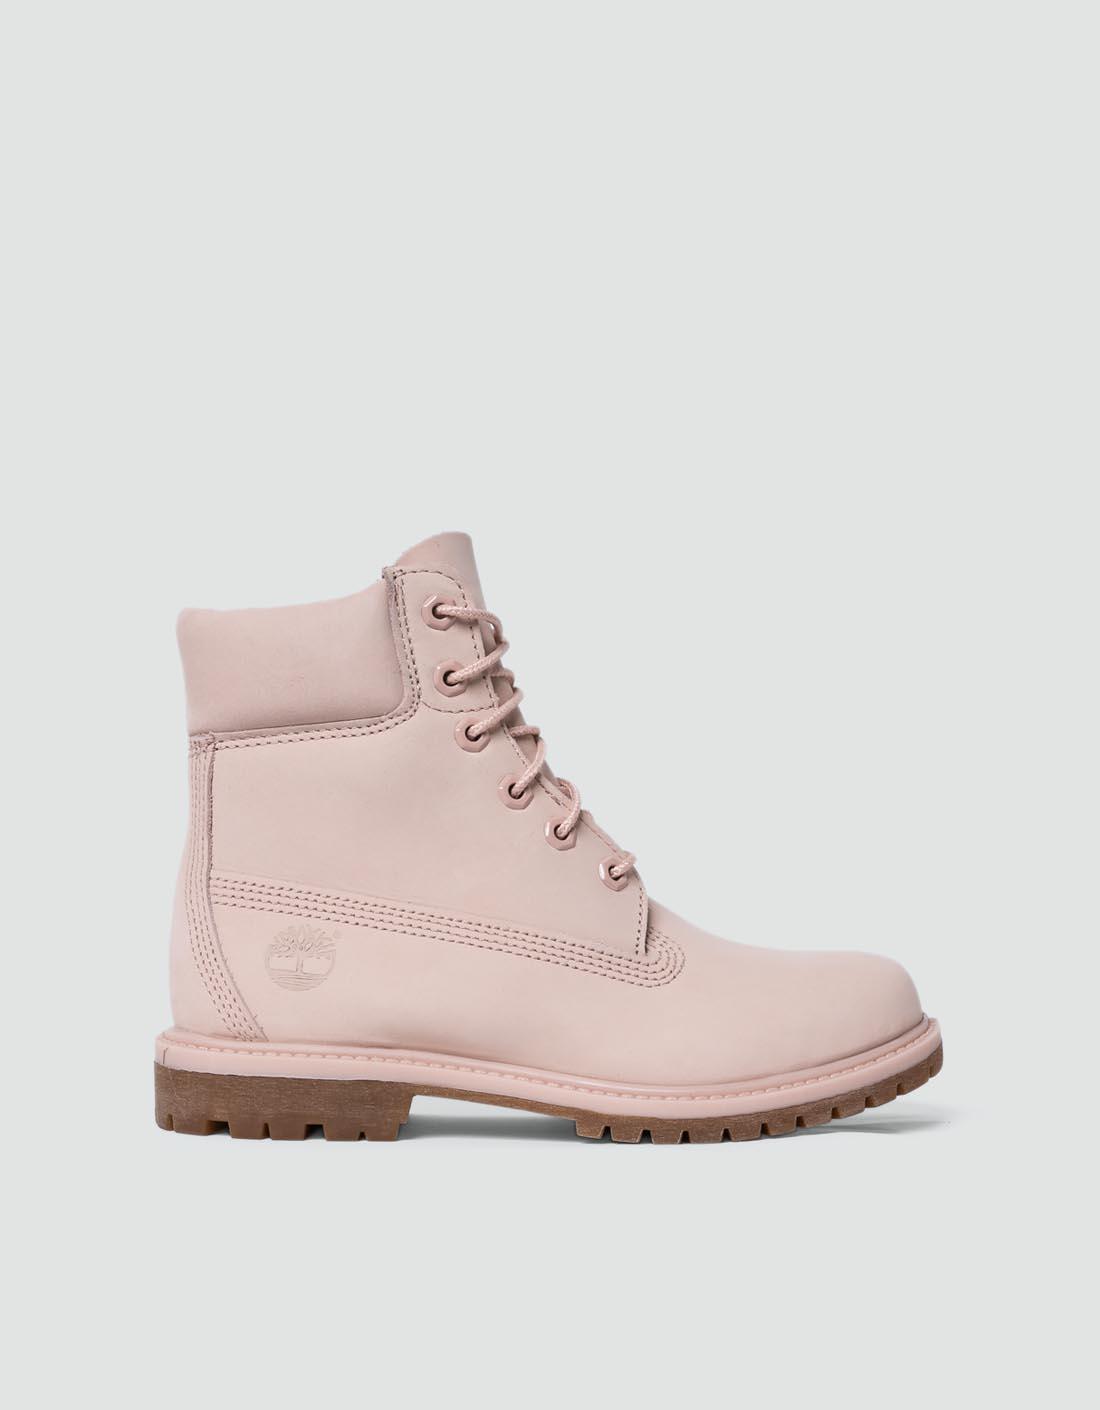 Timberland Damen Schuhe cameo rose Stiefelette mit markanter